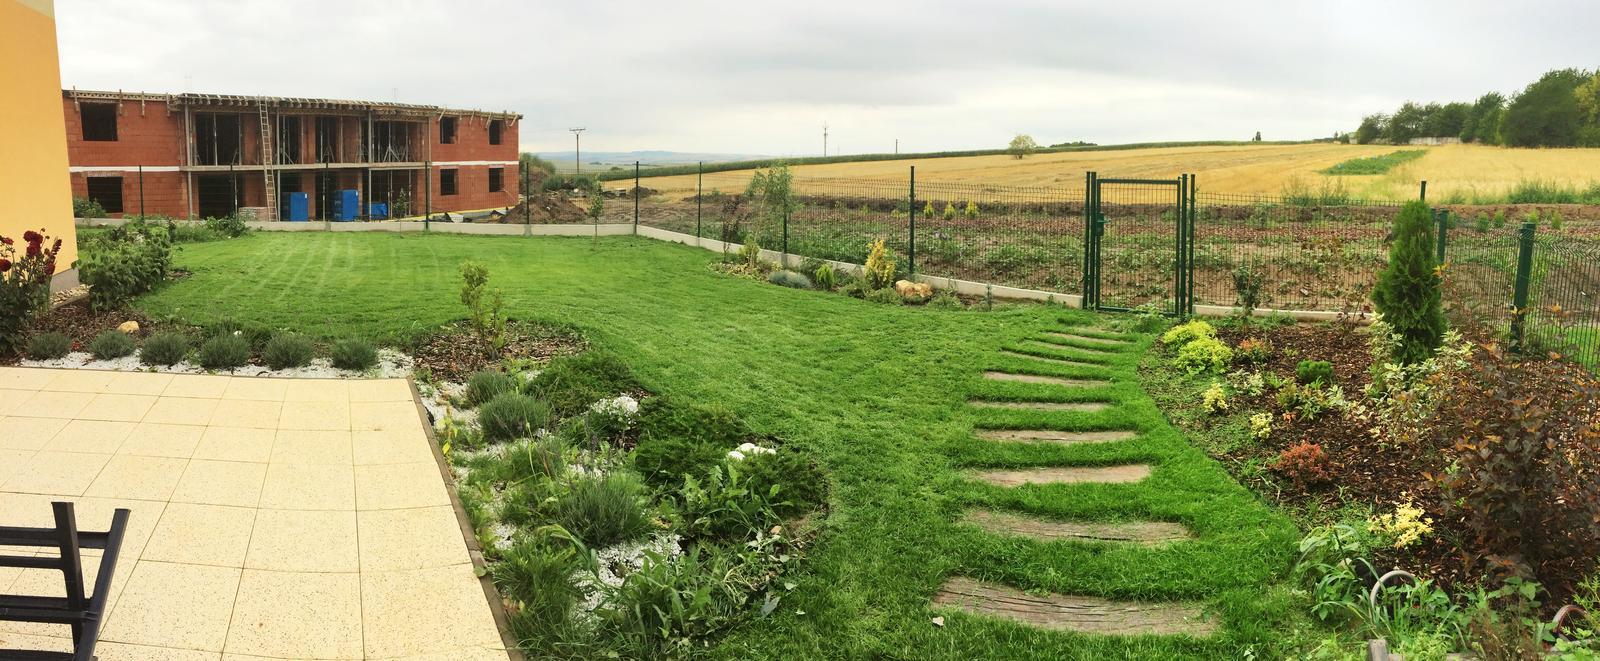 Zahrada- jak to vsechno zacalo.. - a prva panorama zahrady :)